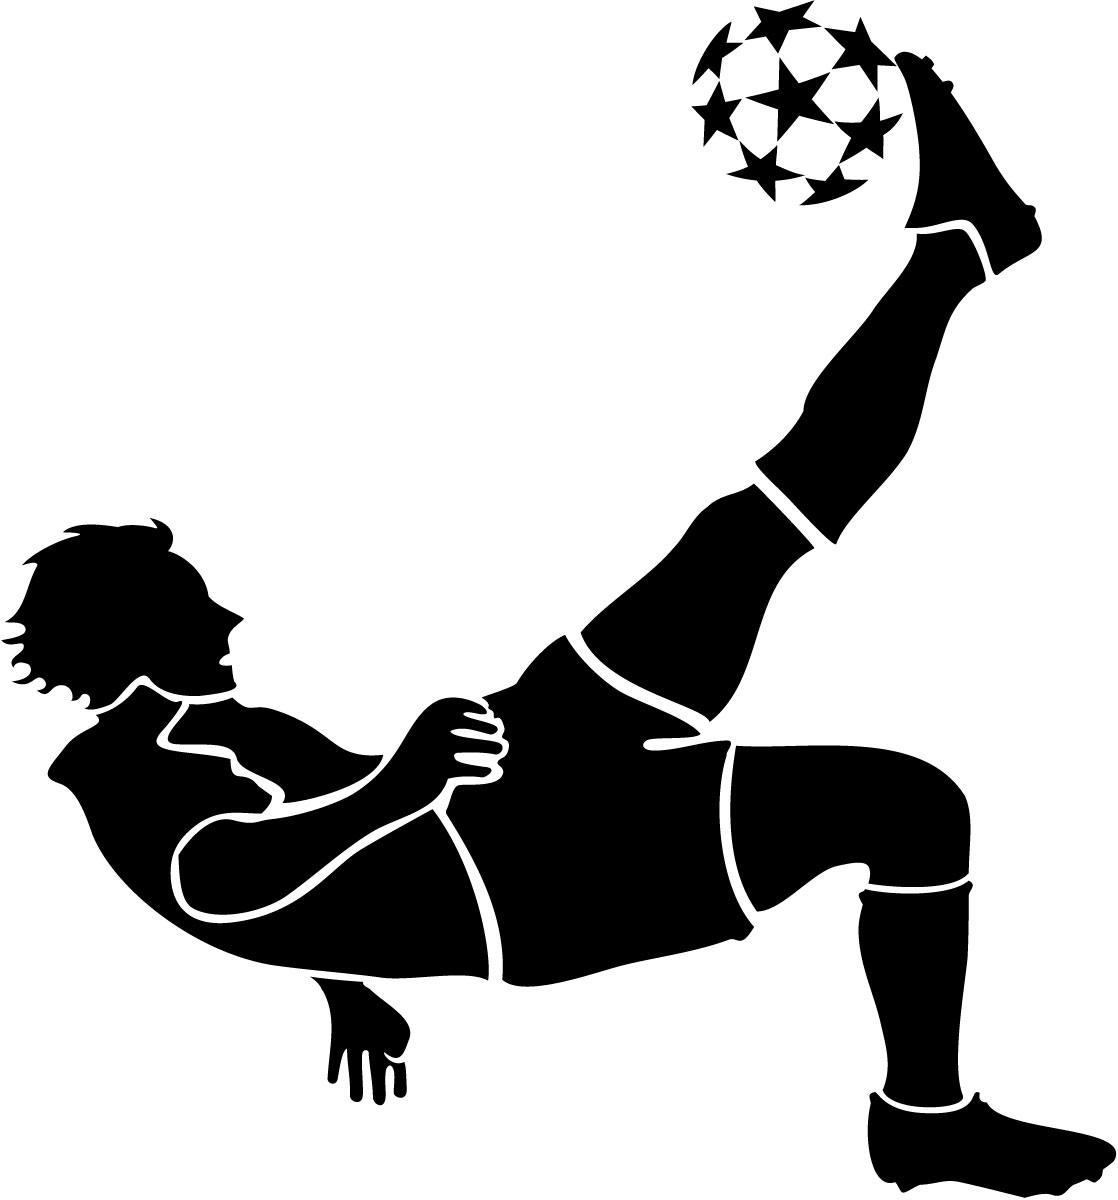 Futsal clipart 3 » Clipart Station.